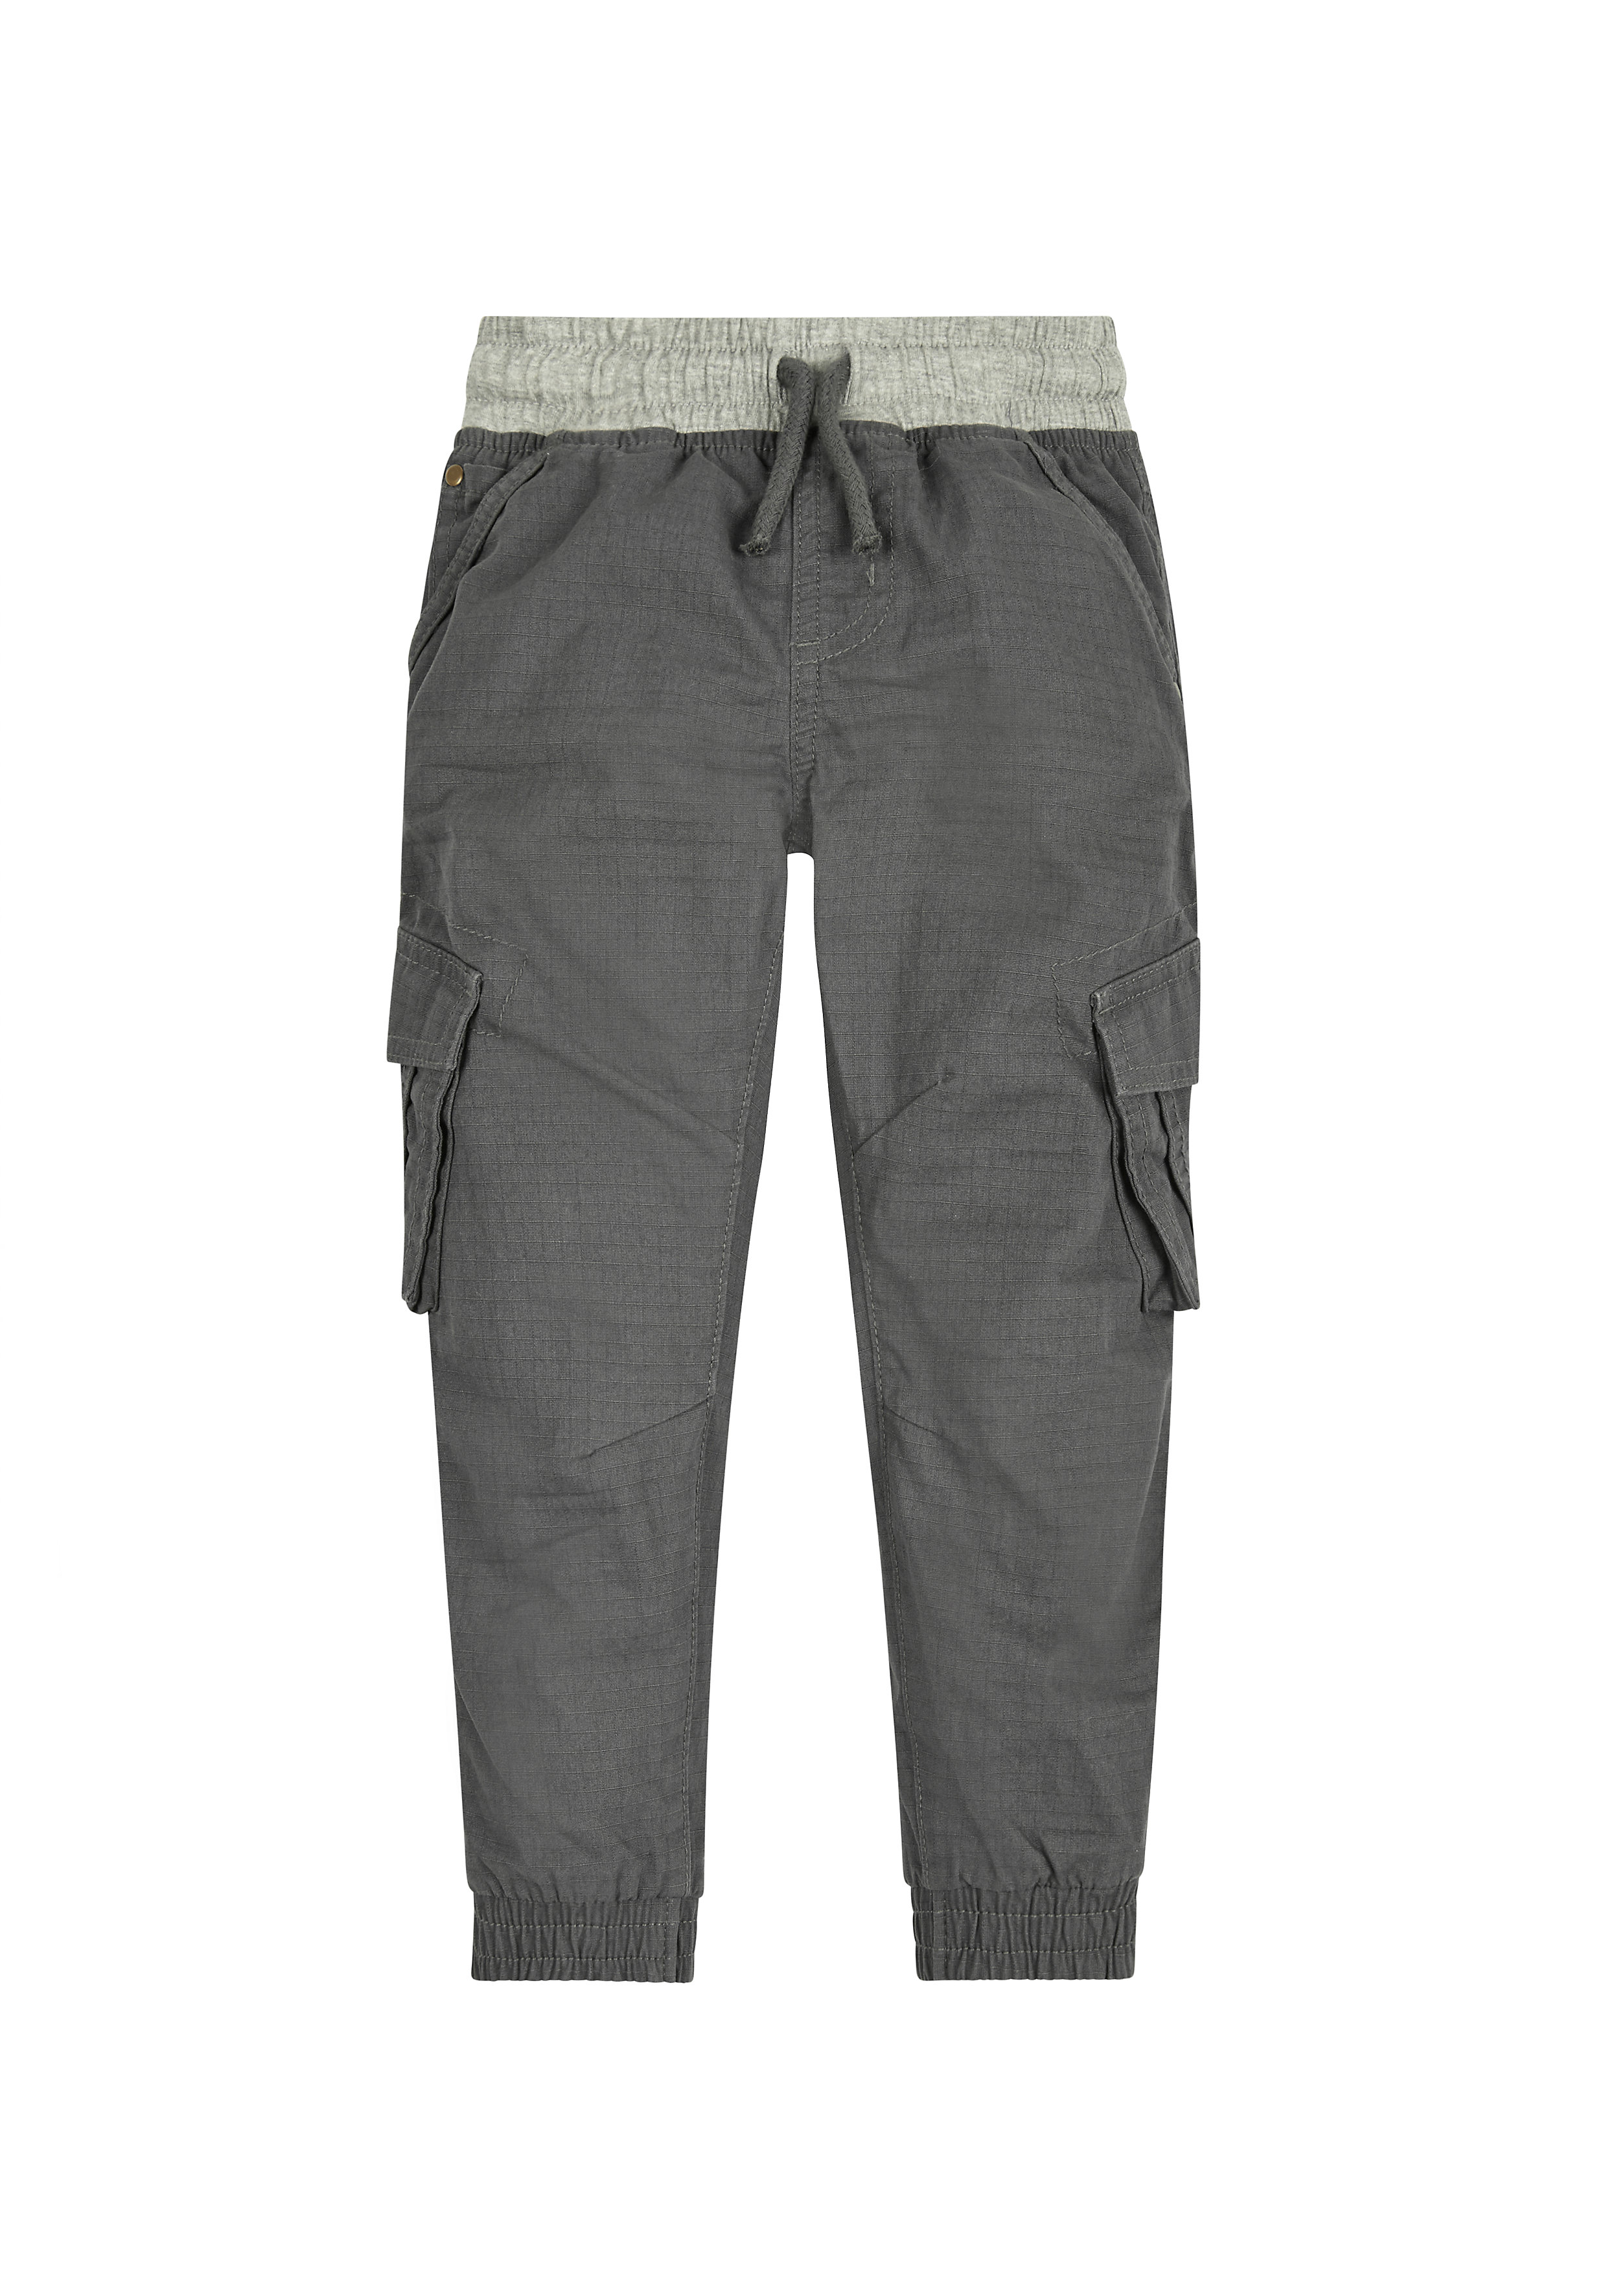 Mothercare | Boys Cargo Trousers Rib Waist - Grey